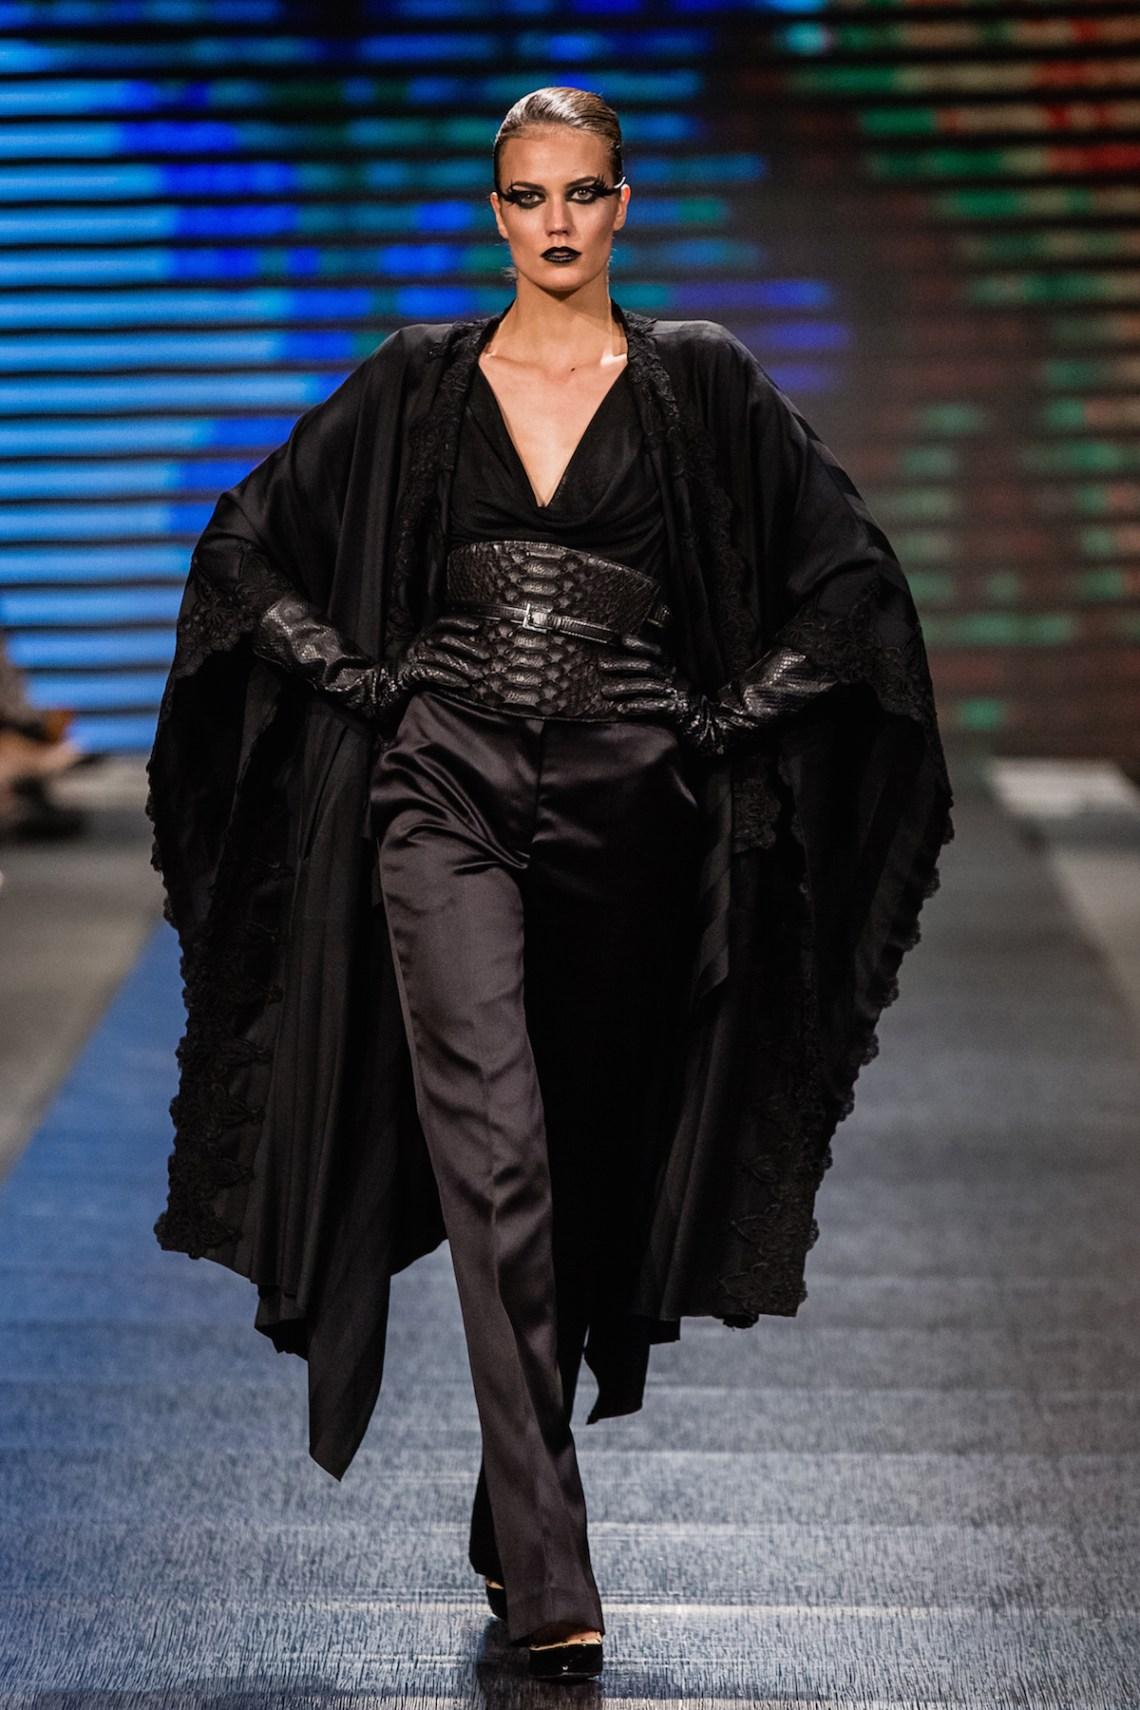 ZVONKO MARKOVIC - Encore Presentation at the Serbia Fashion Week